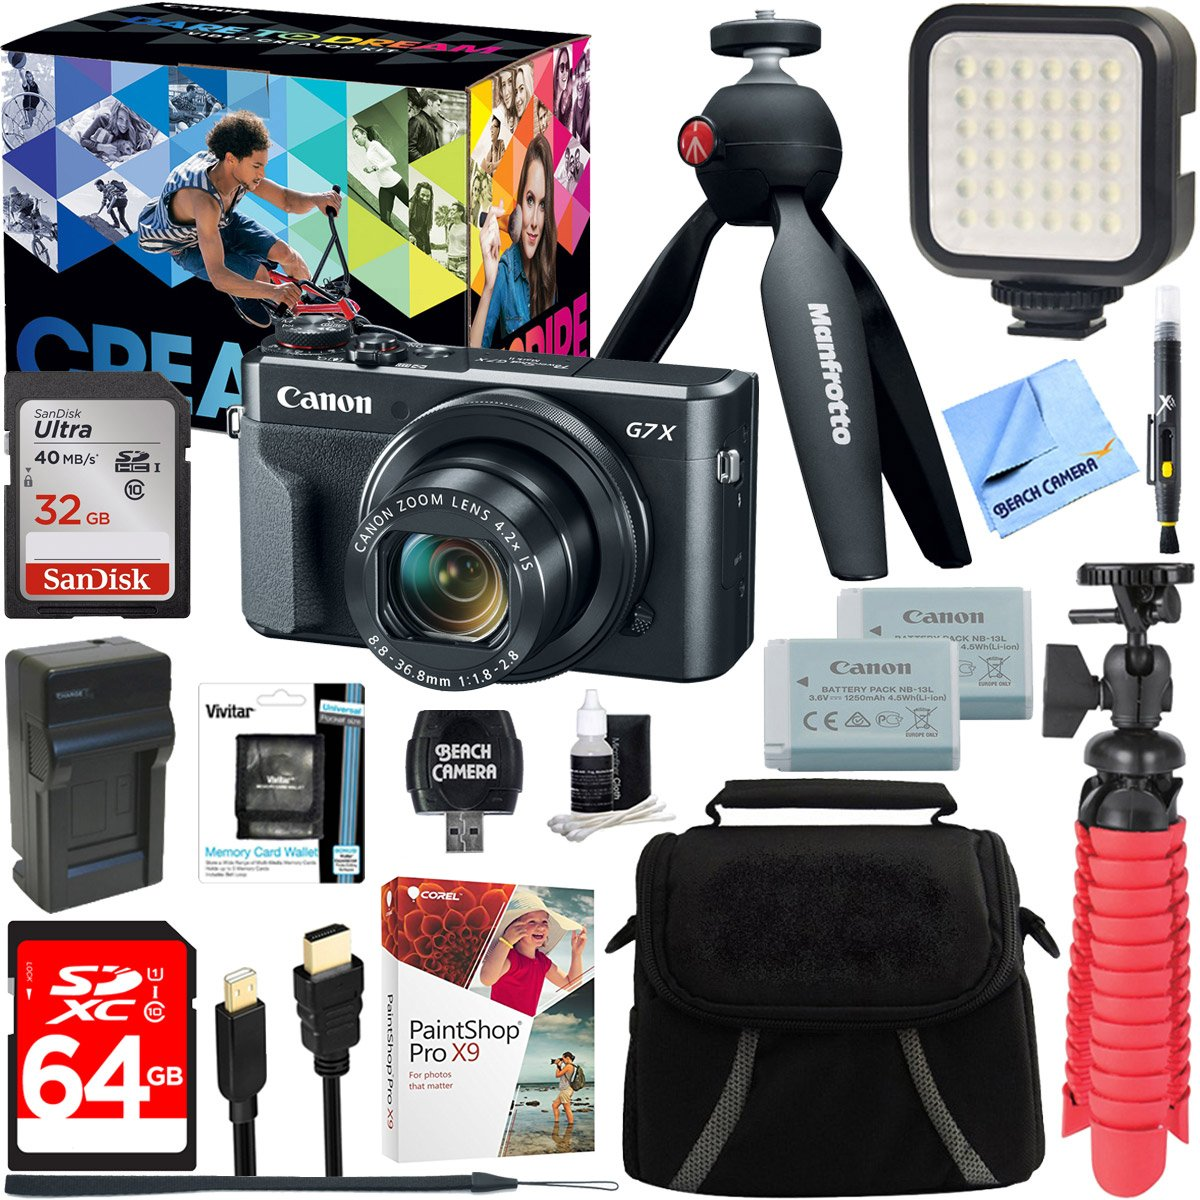 Canon PowerShot G7 X Mark II 20.1MP 4.2x Optical Zoom Digital Camera Video Creator Kit + 64GB SDXC Memory Card + Accessory Bundle by Beach Camera